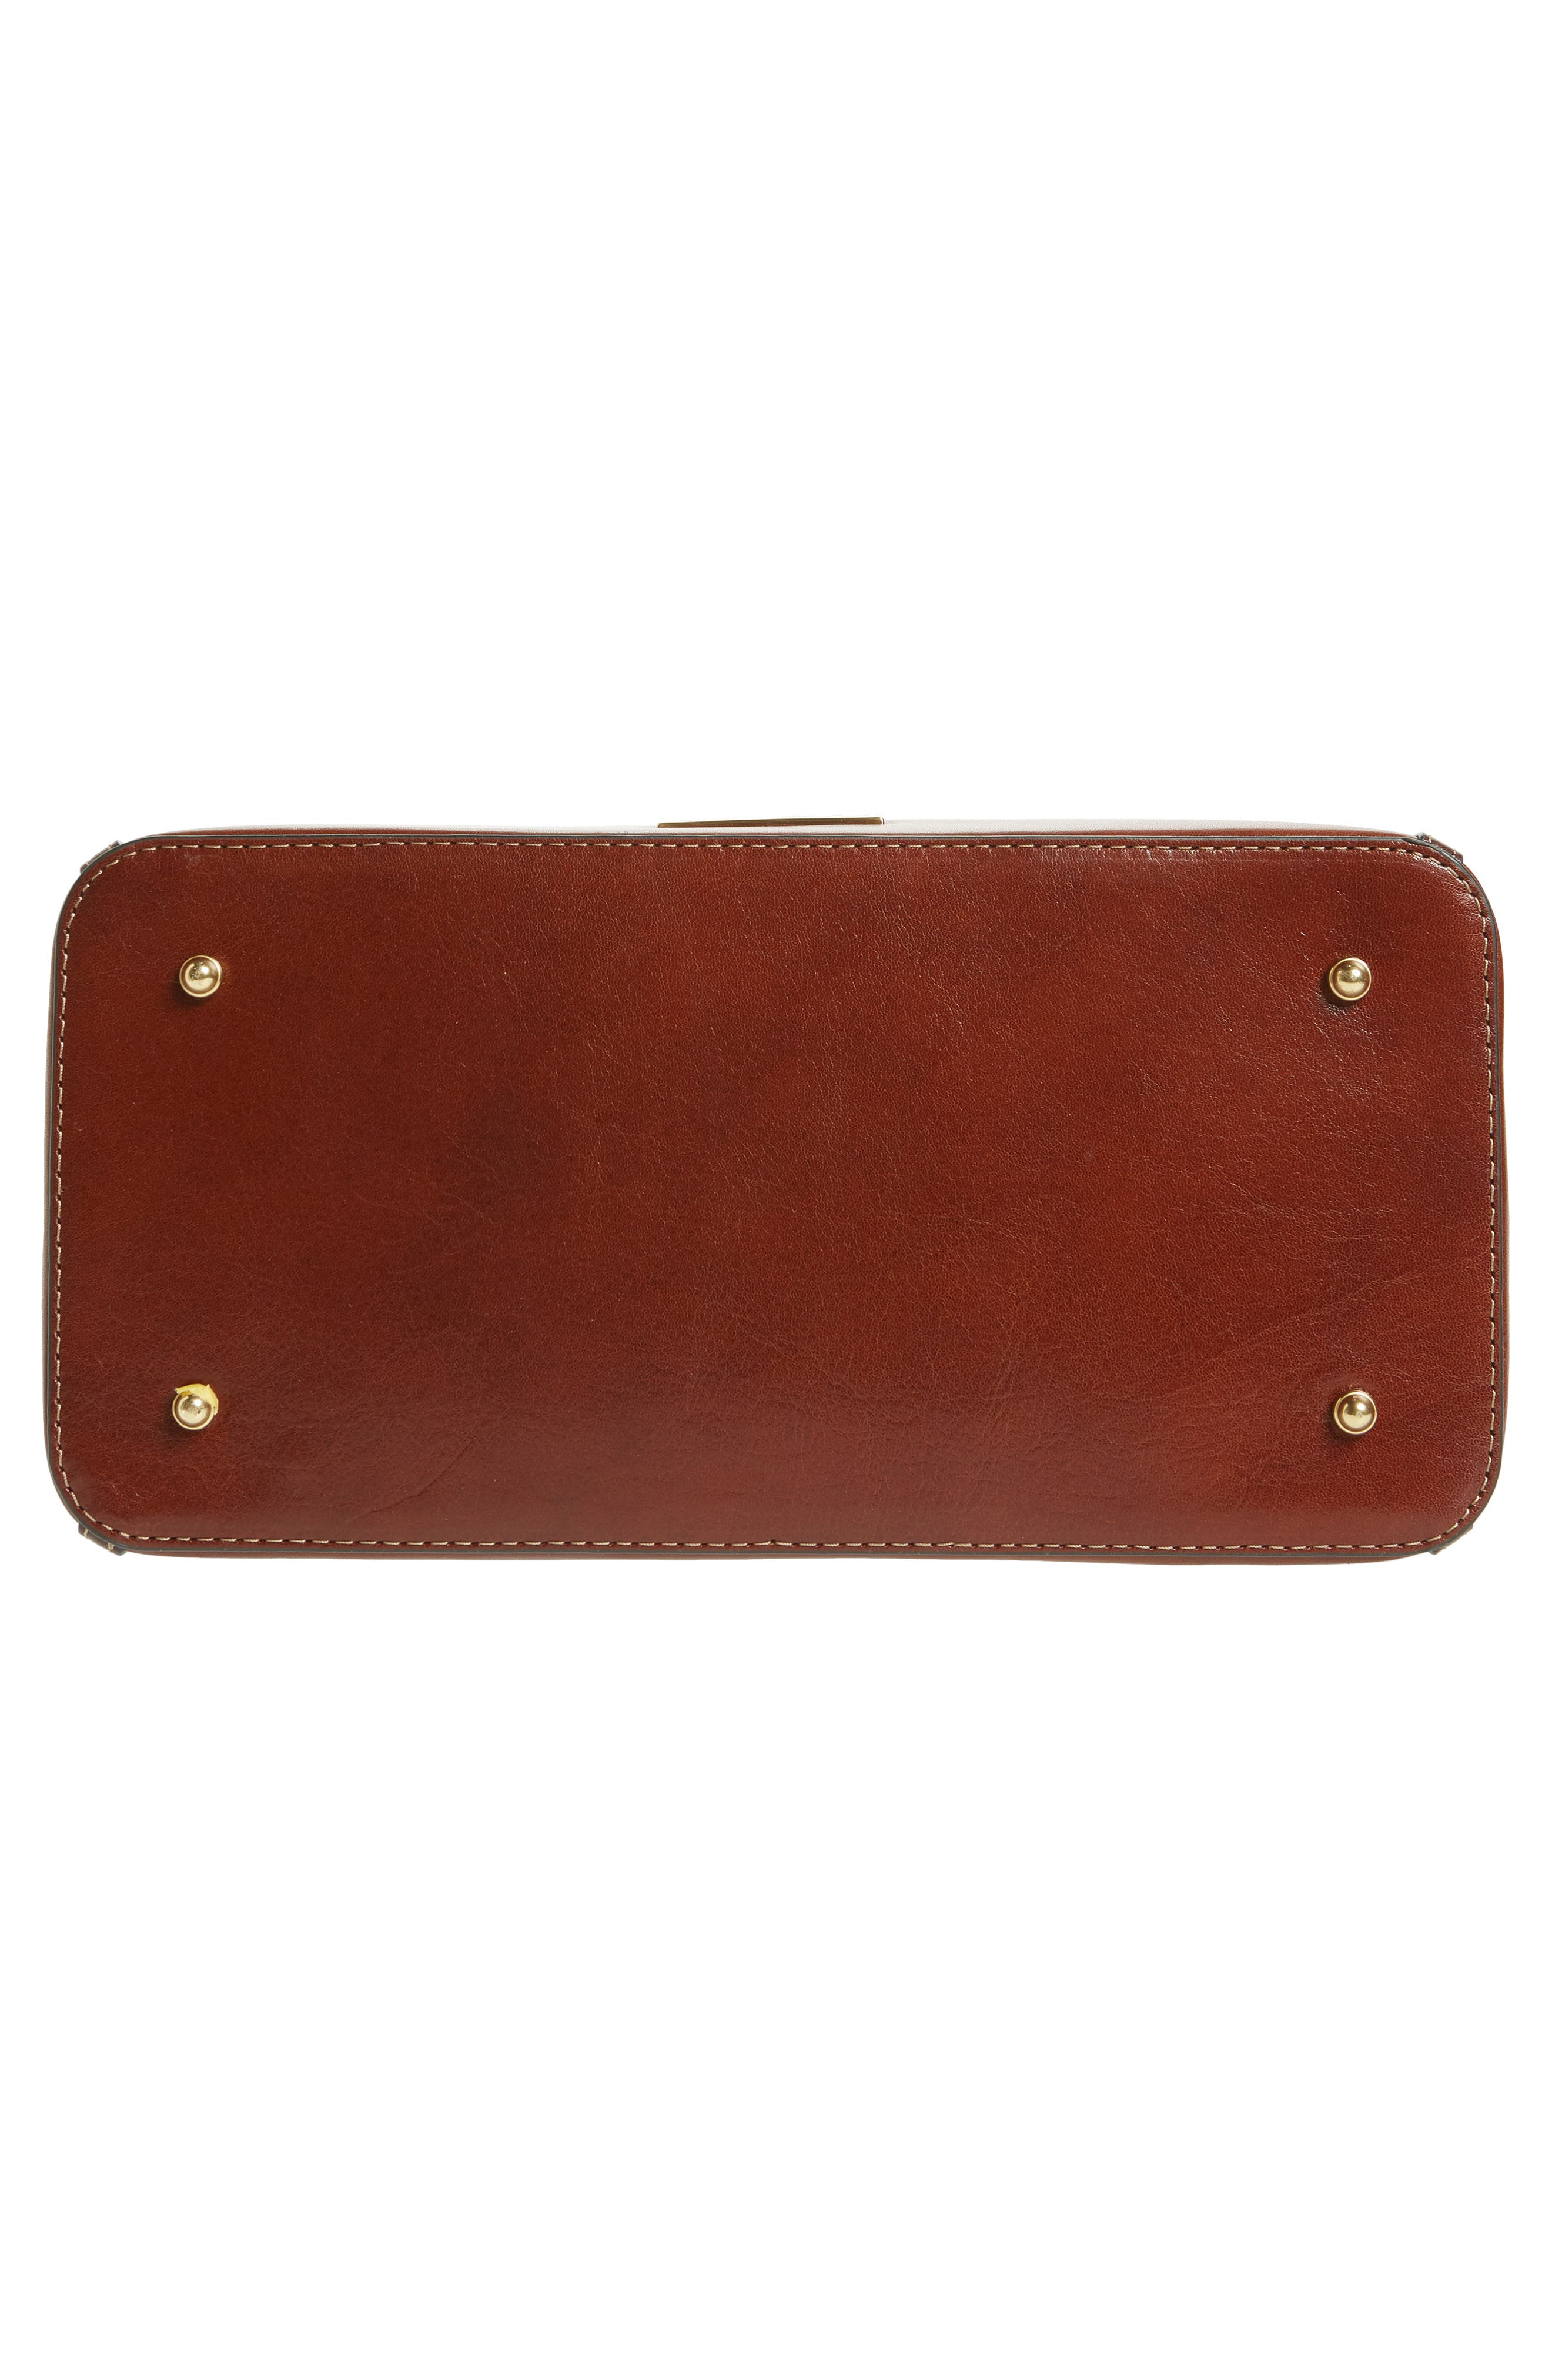 Schooner Leather Satchel,                             Alternate thumbnail 6, color,                             200